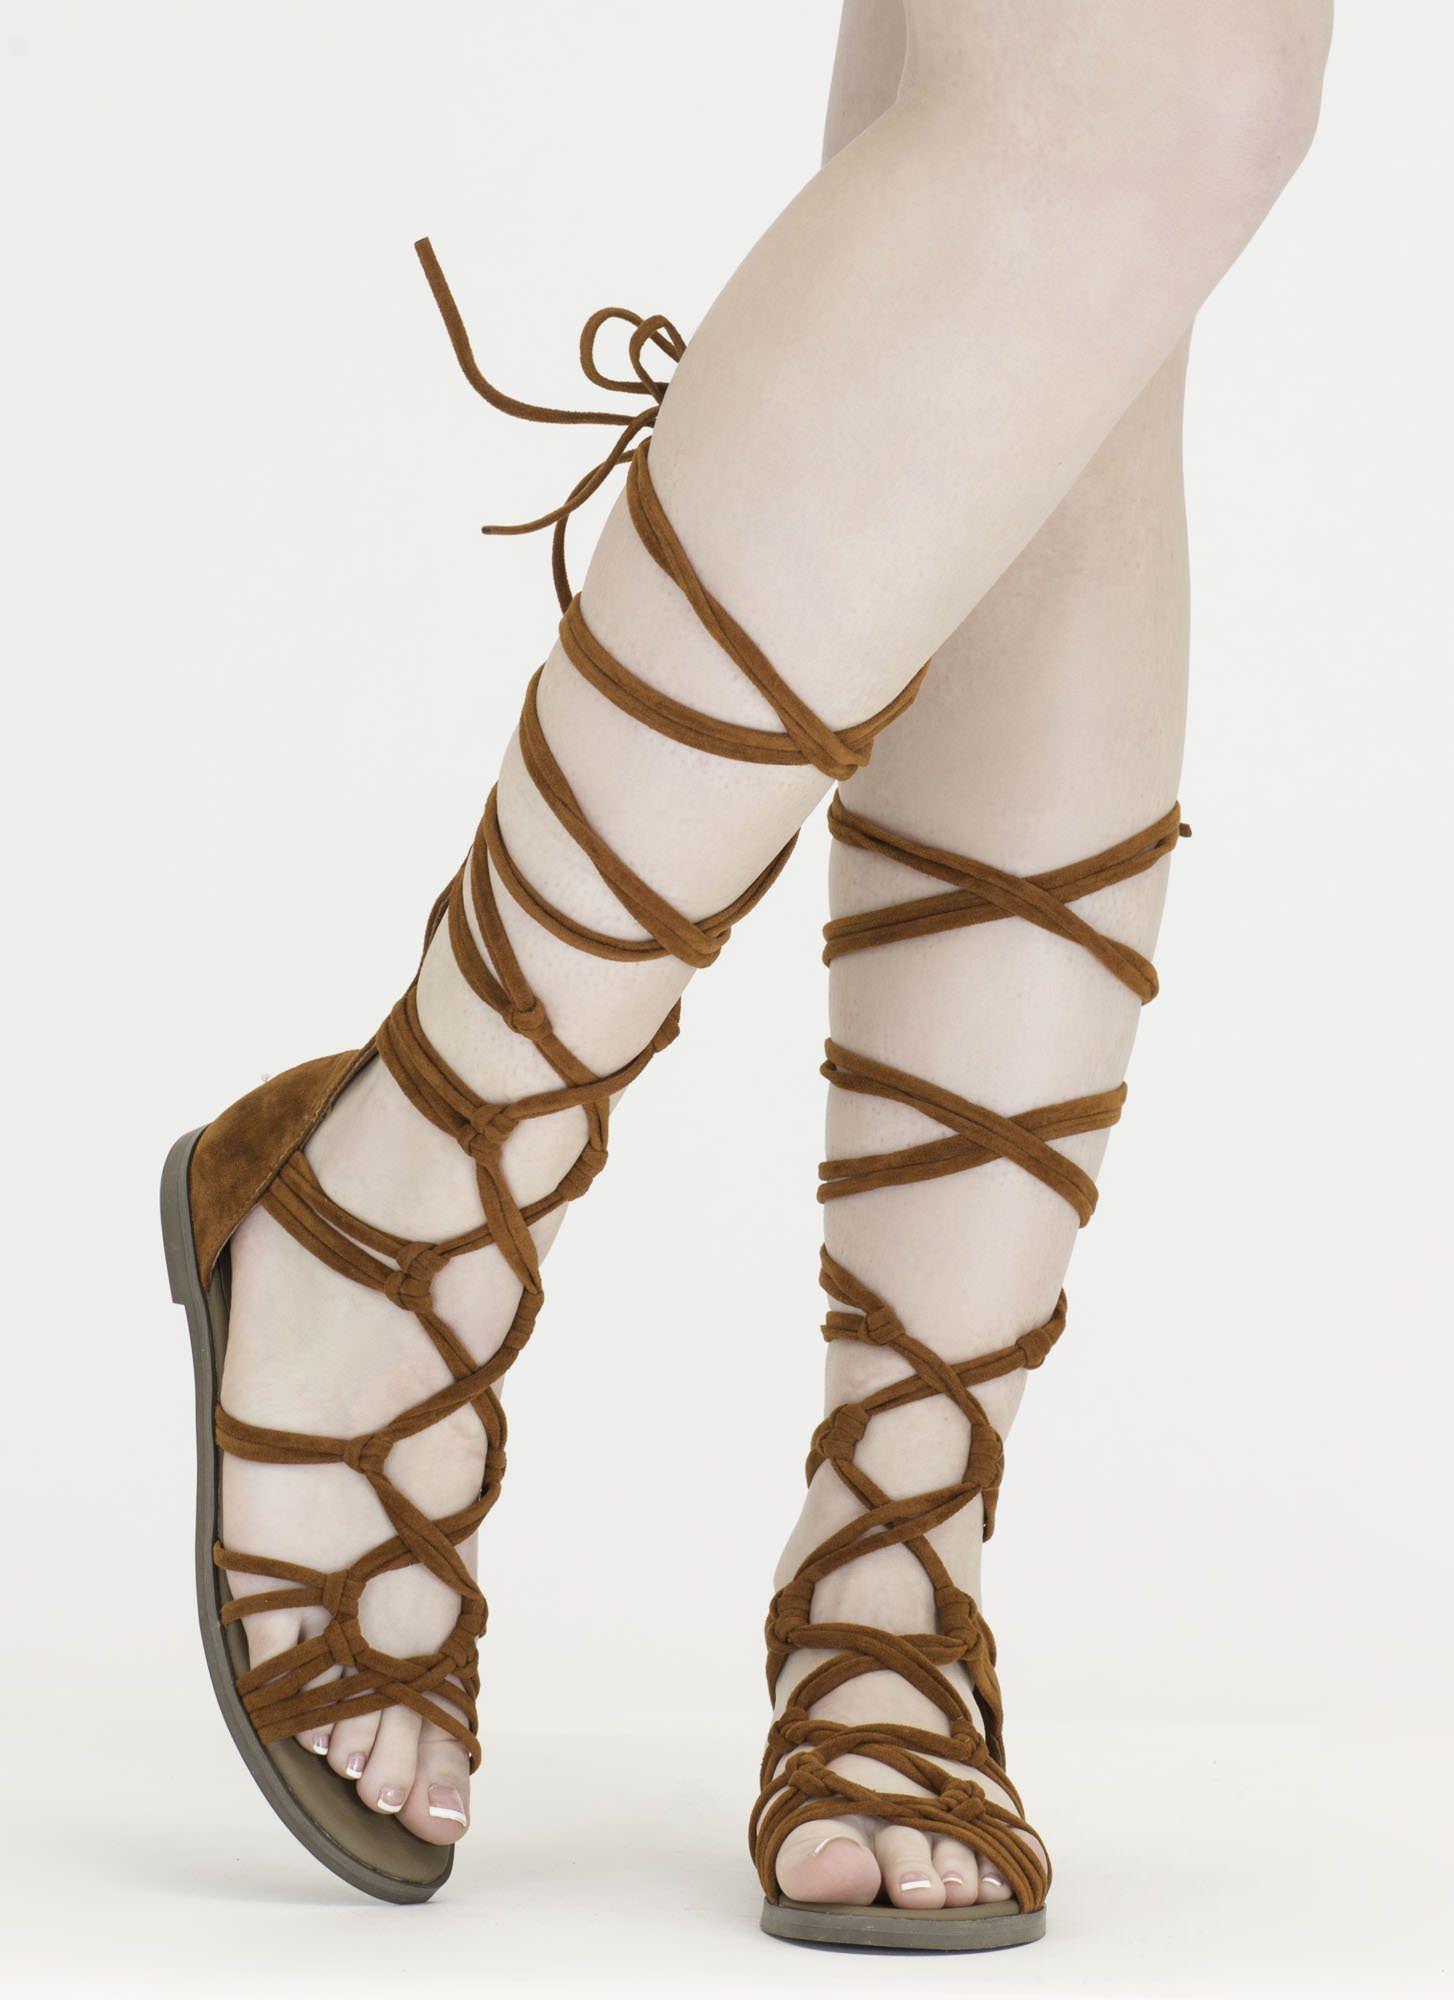 5270a06ffb3b Knotty By Nature Gladiator Sandals GoJane.com